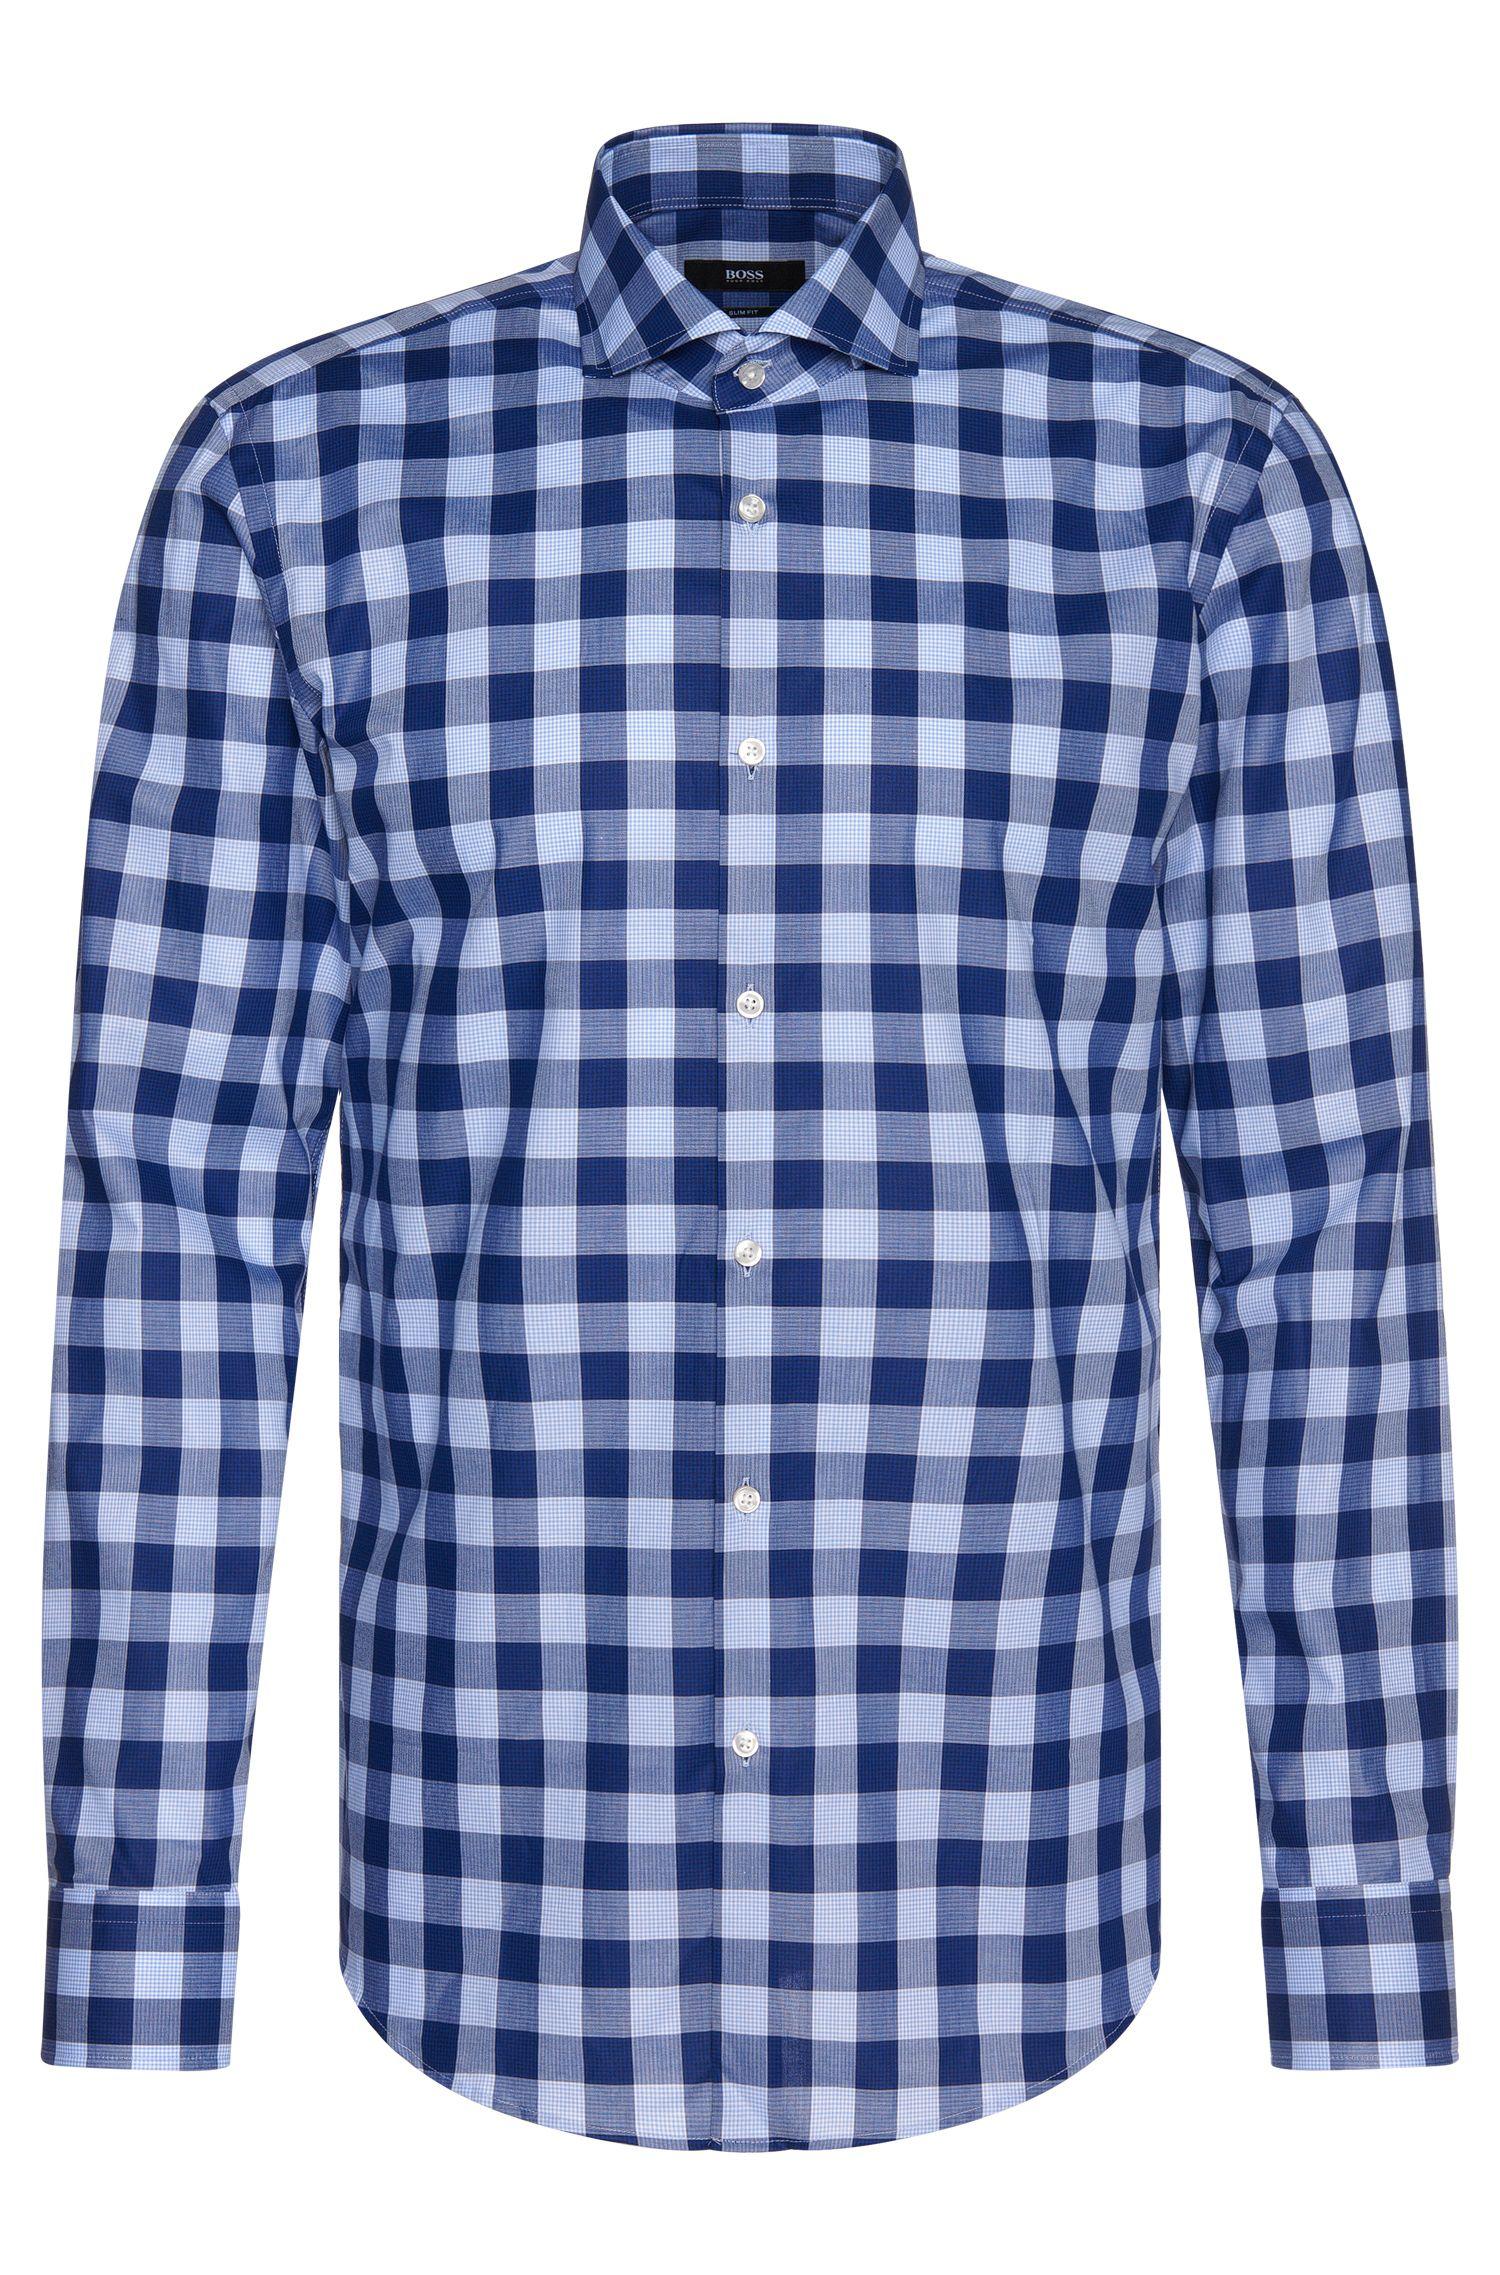 Kariertes Slim-Fit Hemd aus Baumwolle: 'Jason'